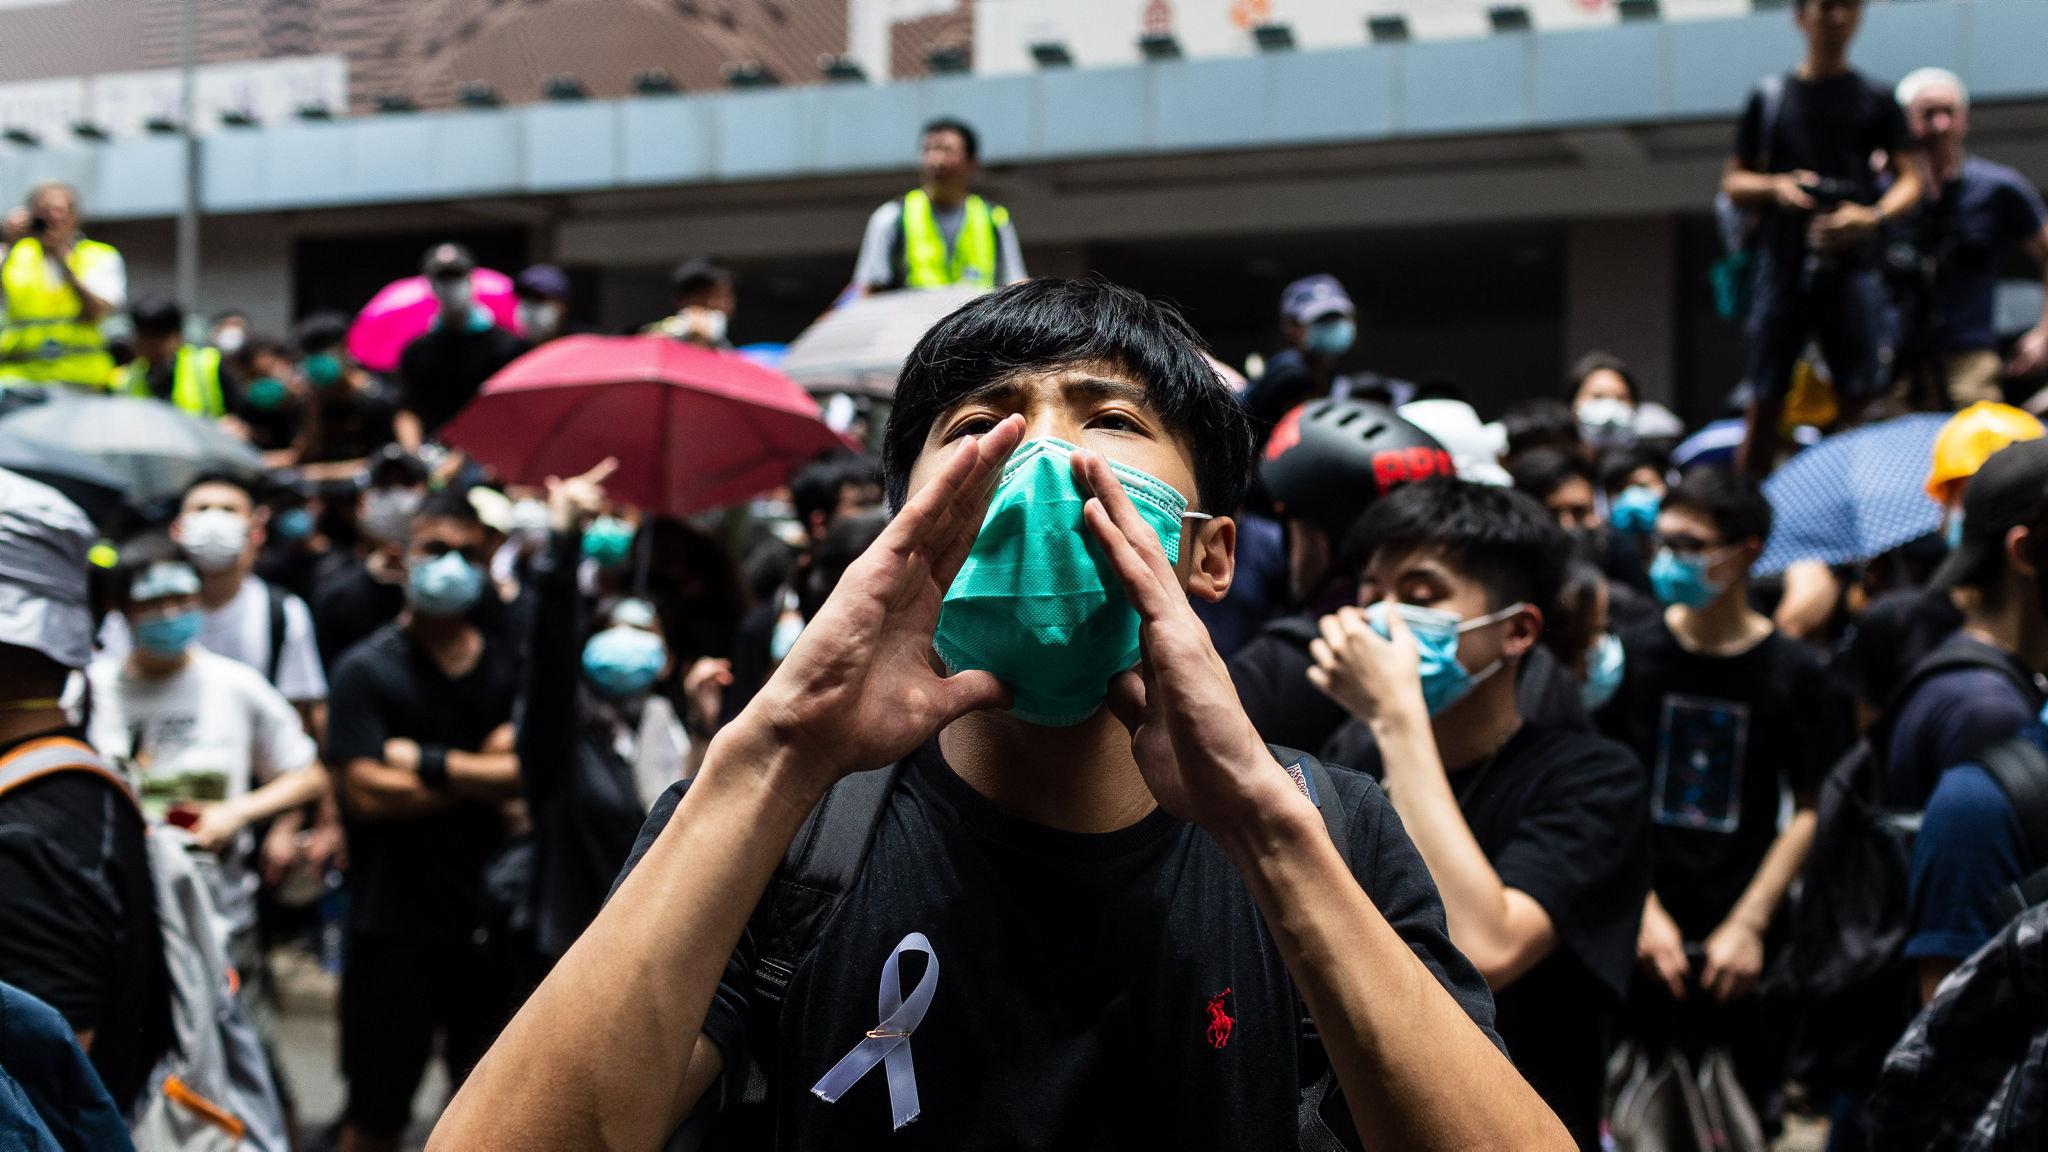 Technology aids unity of Hong Kong movement | Financial Times